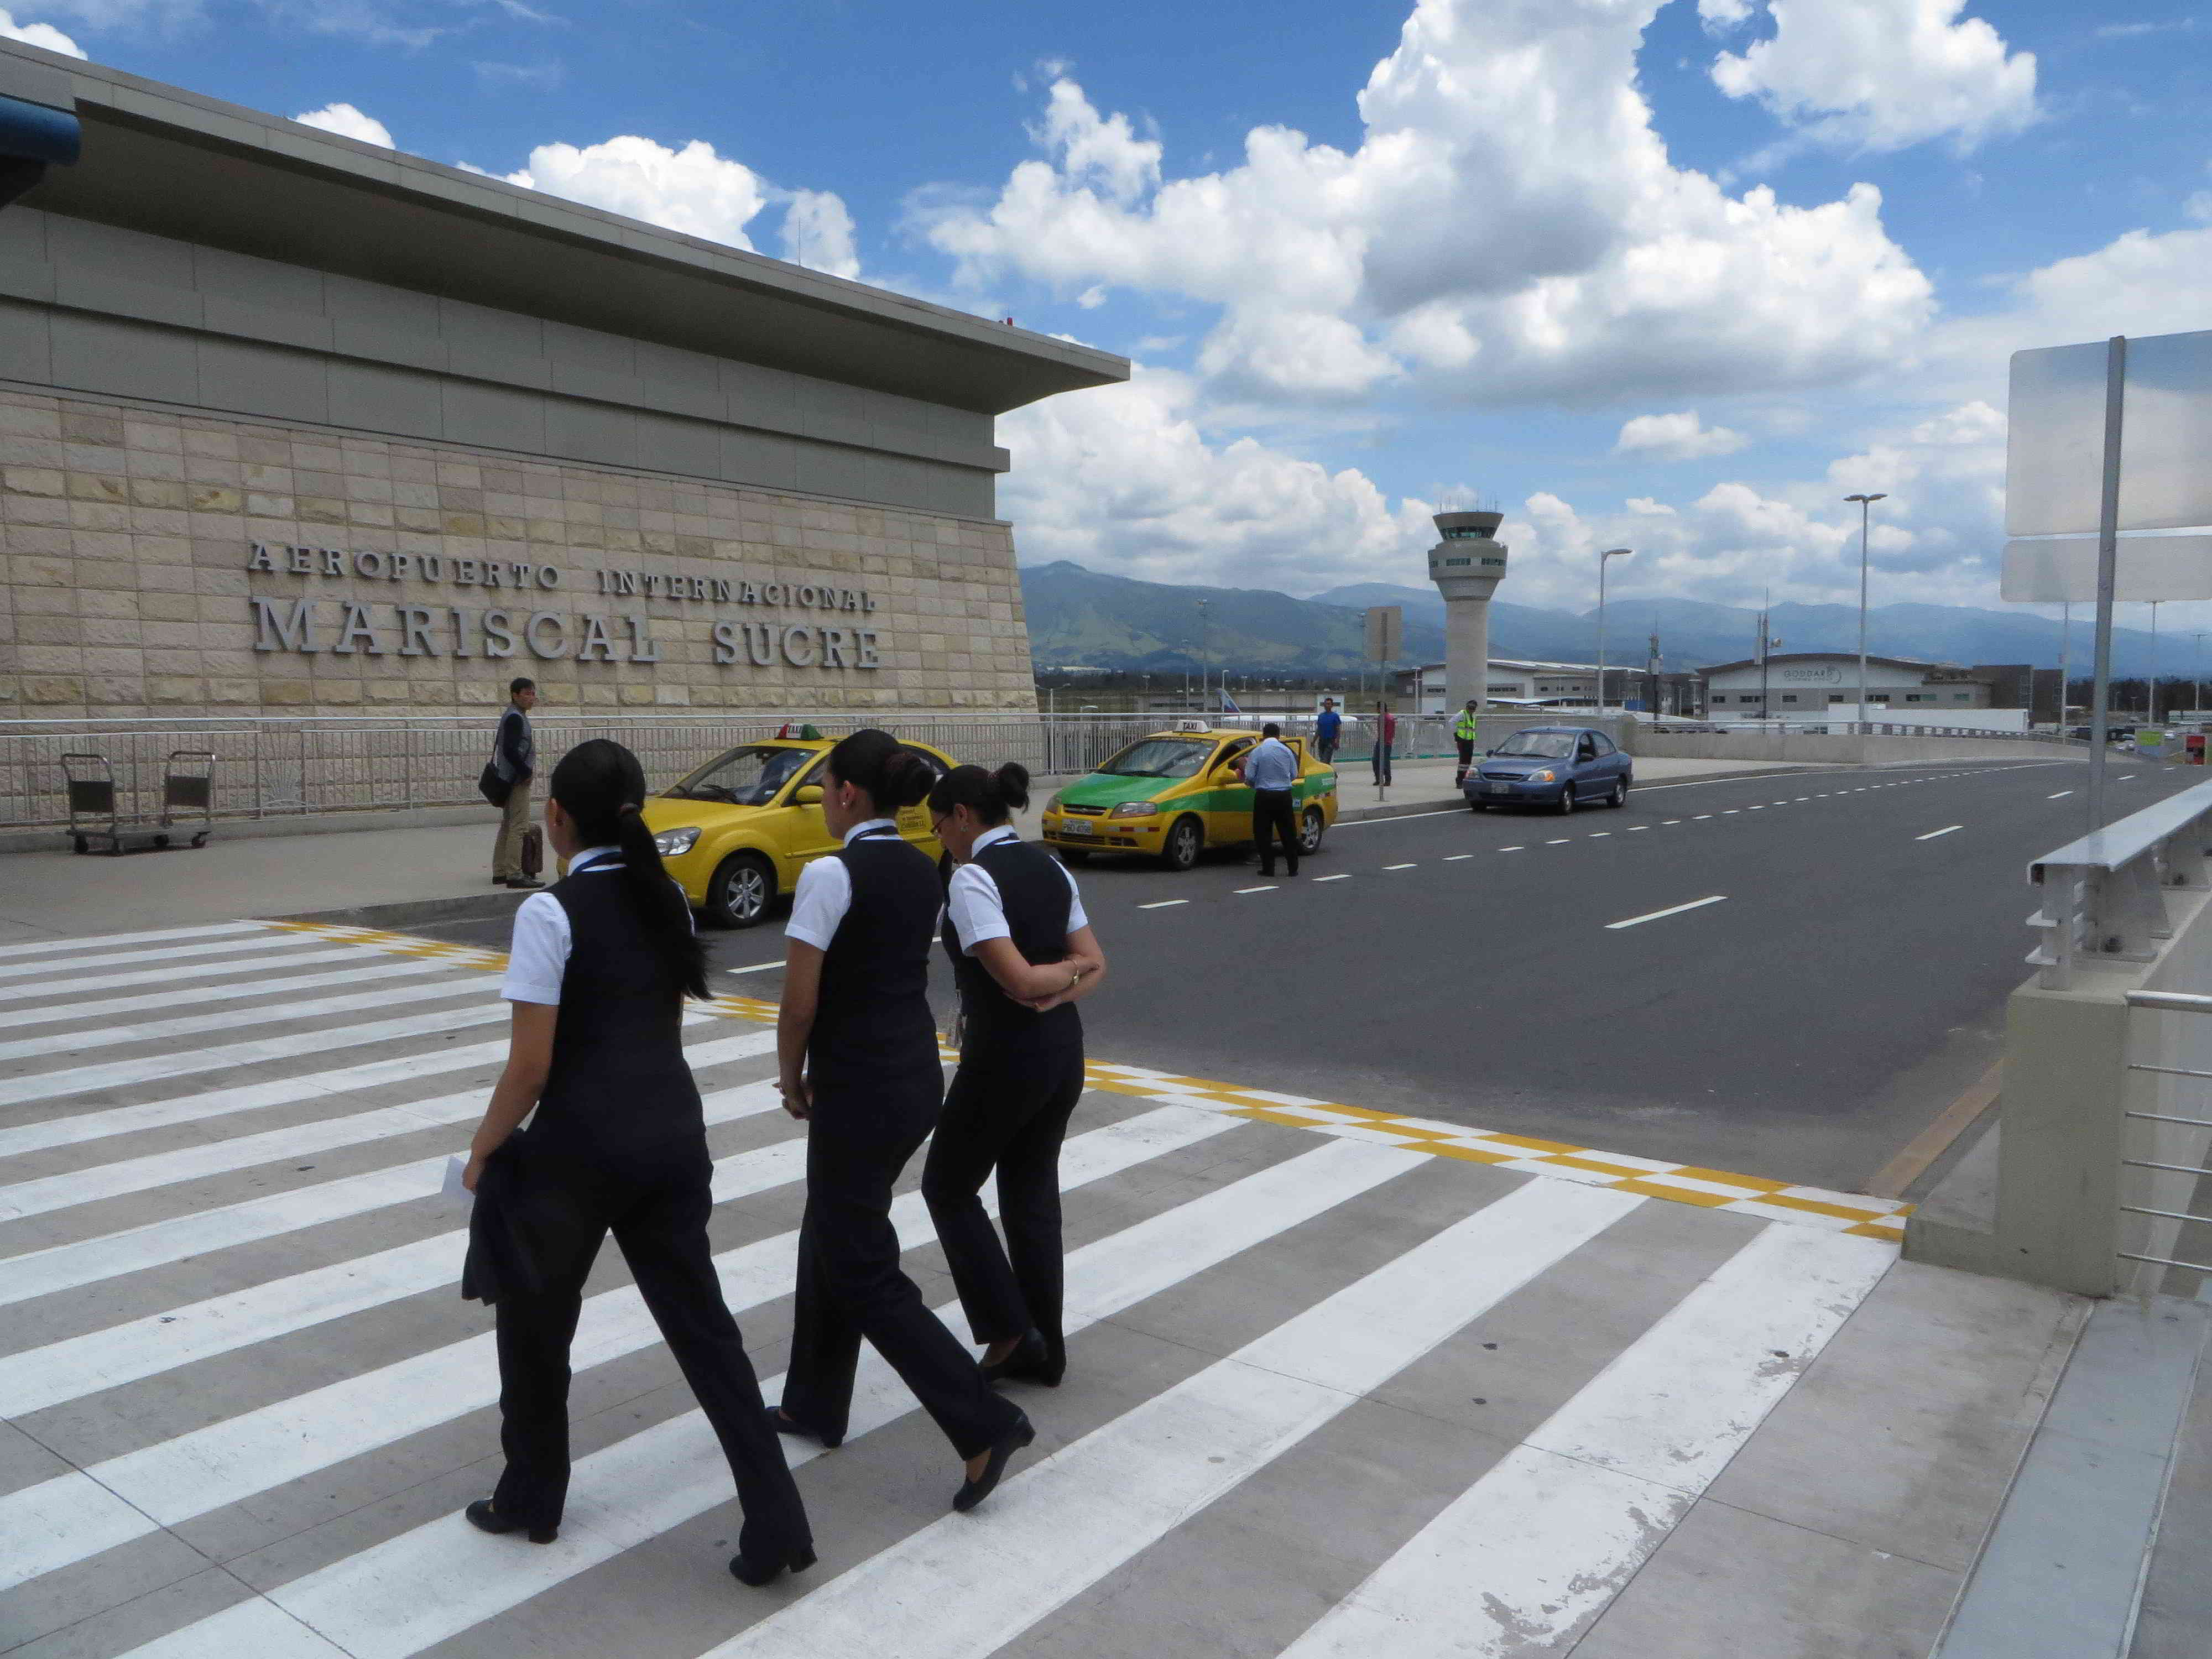 New Mariscal Sucre International Airport Quito Ecuador Uio